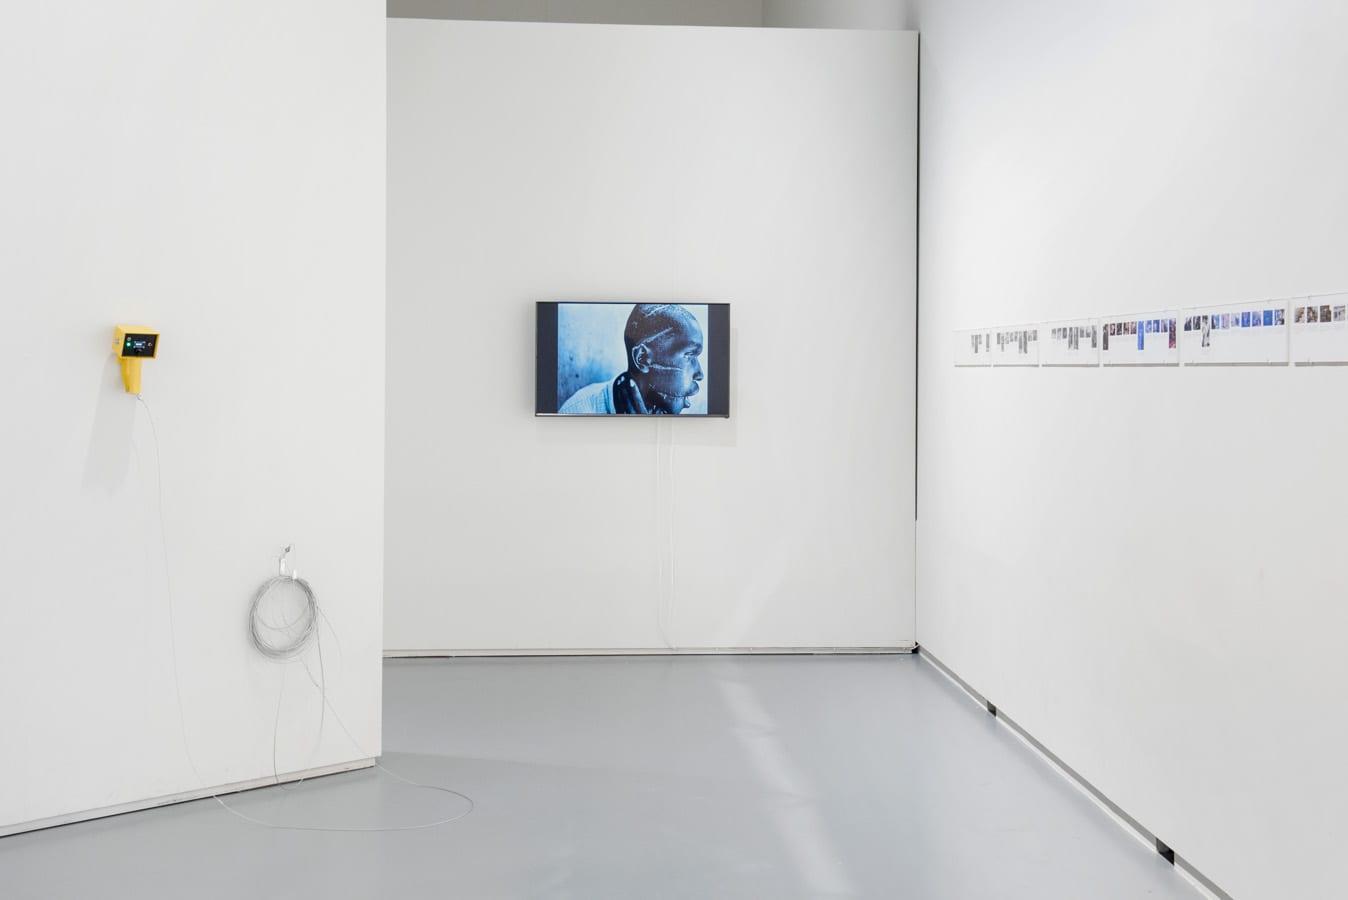 Dries Depoorter & Max Pinckers - Trophy Camera_FOMU_2017_03